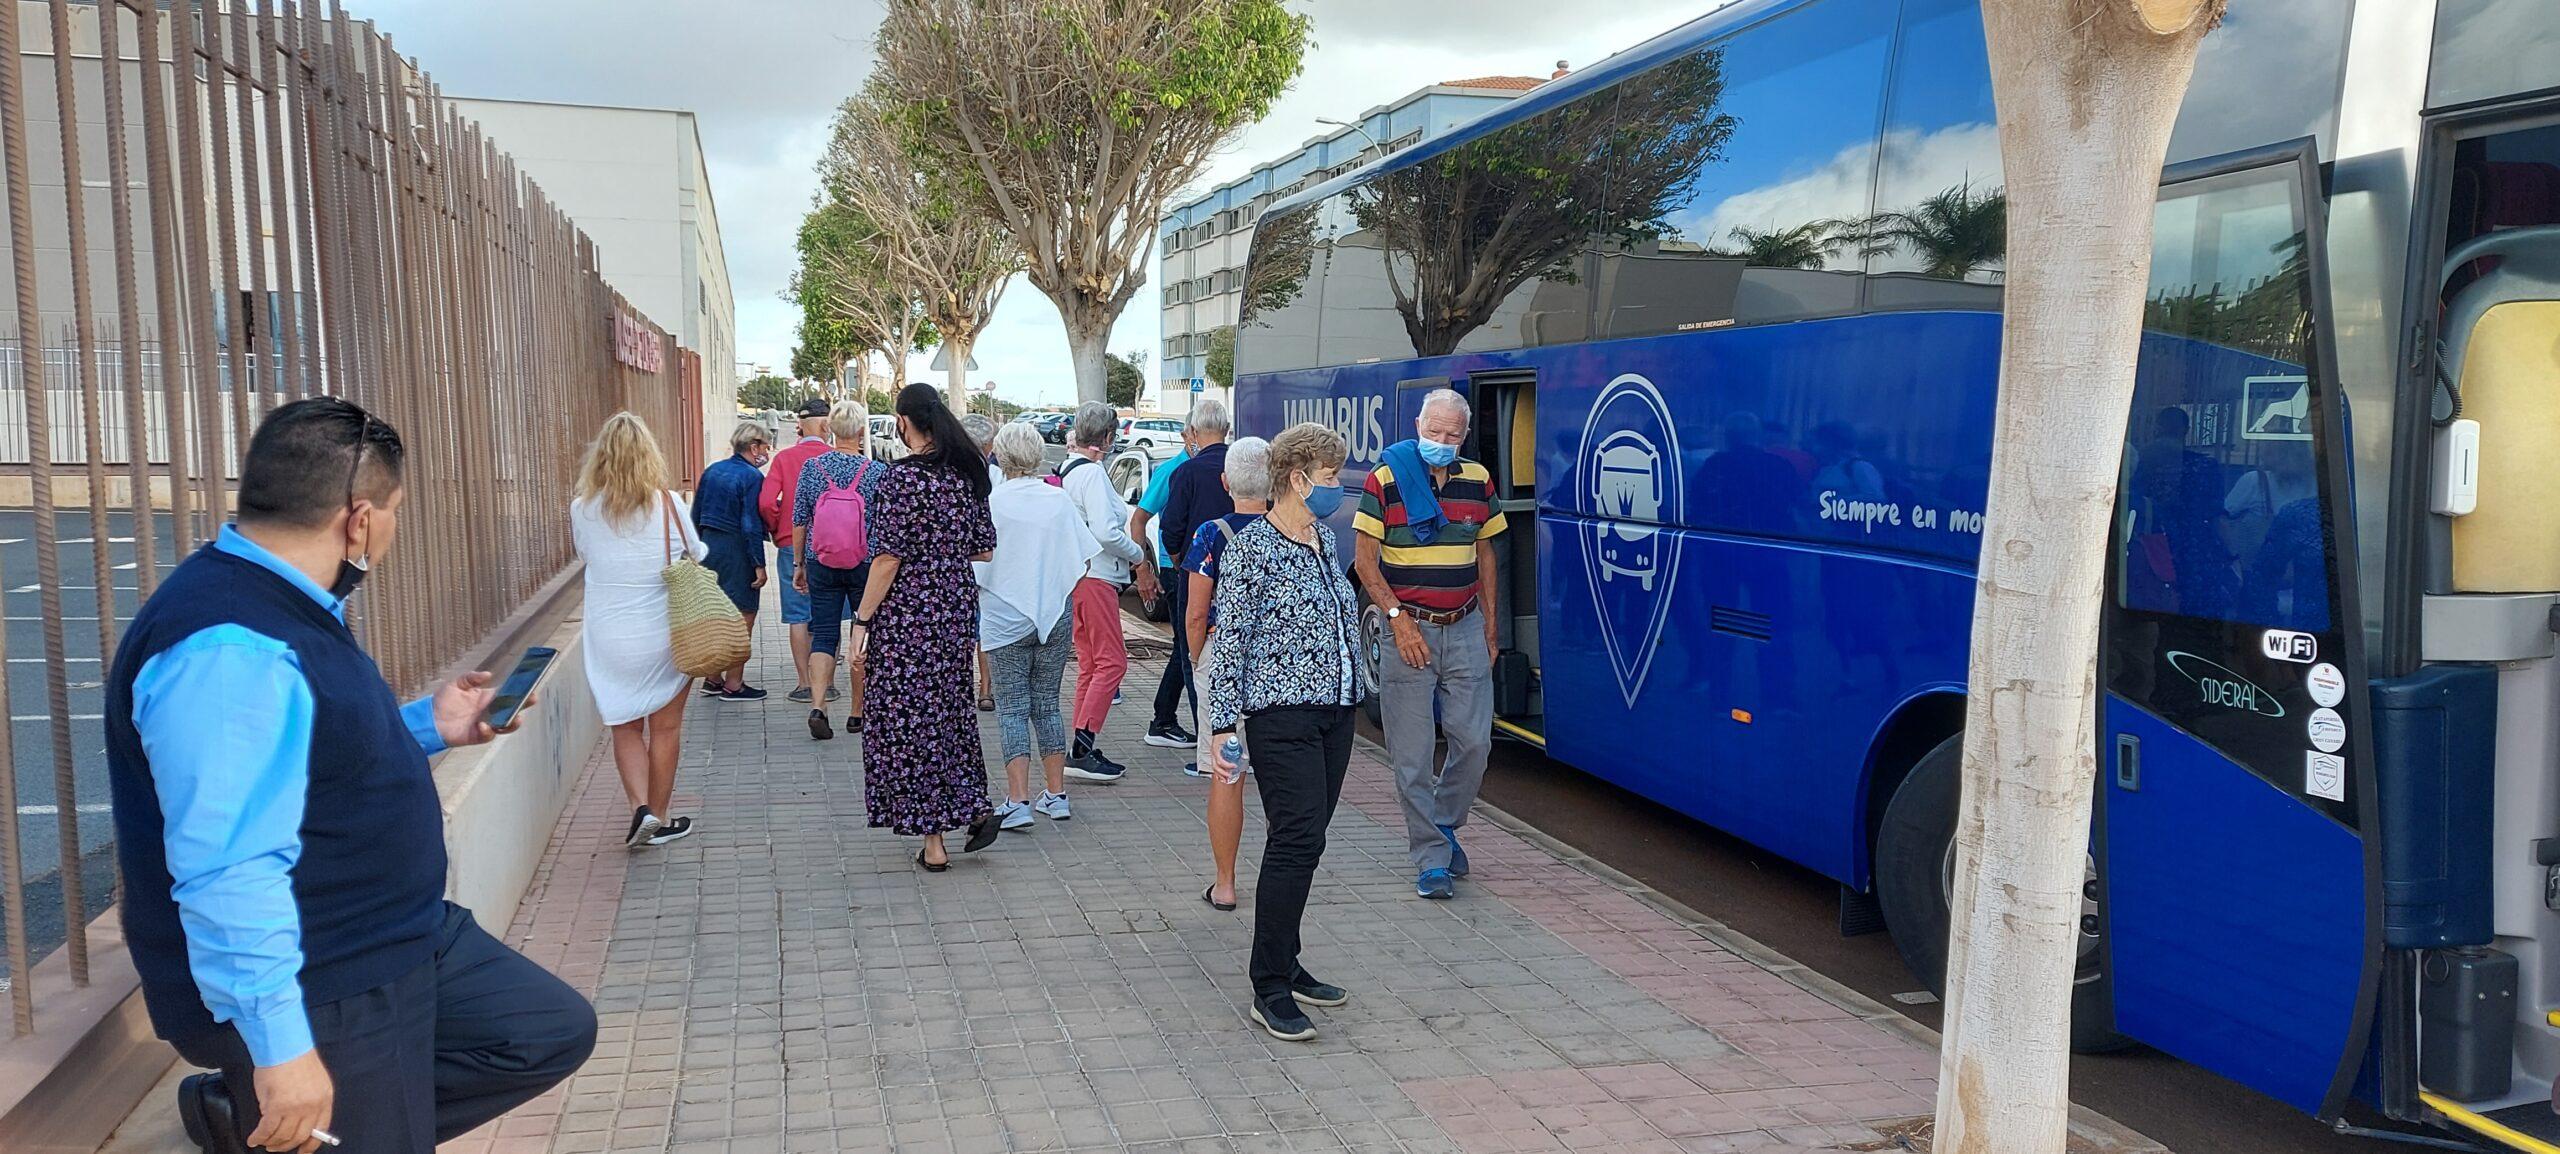 Tur til museer i Vecindario